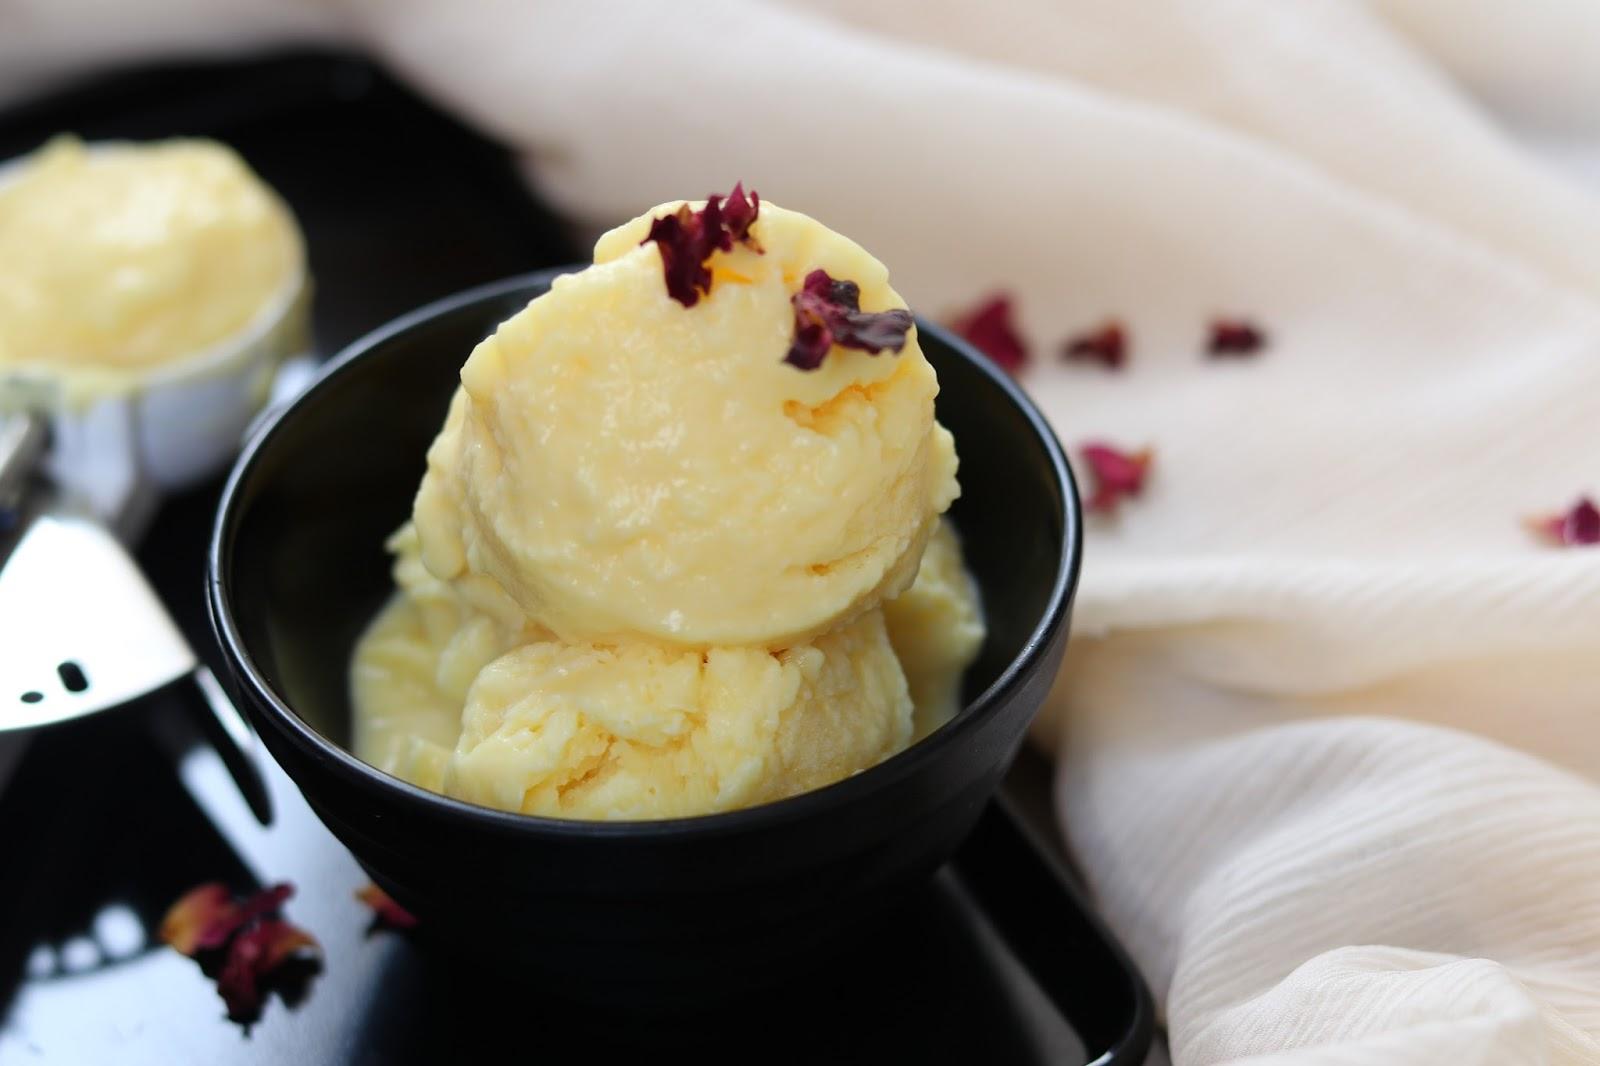 Eggless custard ice cream healthy kadai here is homemade custard ice cream recipe to beat the summer heat vanilla custard ice cream is light simple to make and is eggless ice cream recipe ccuart Images